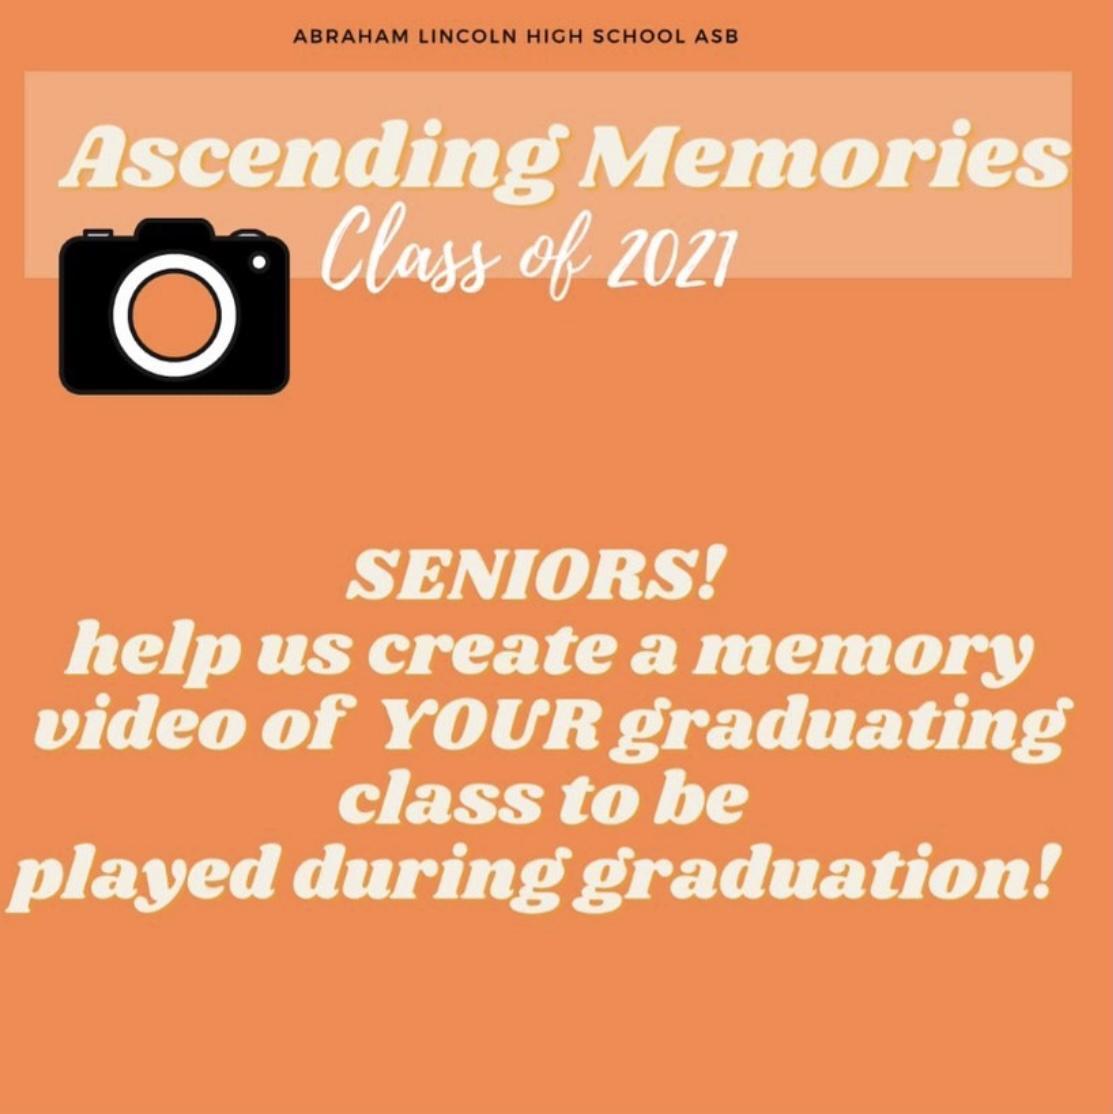 Senior Memory Video